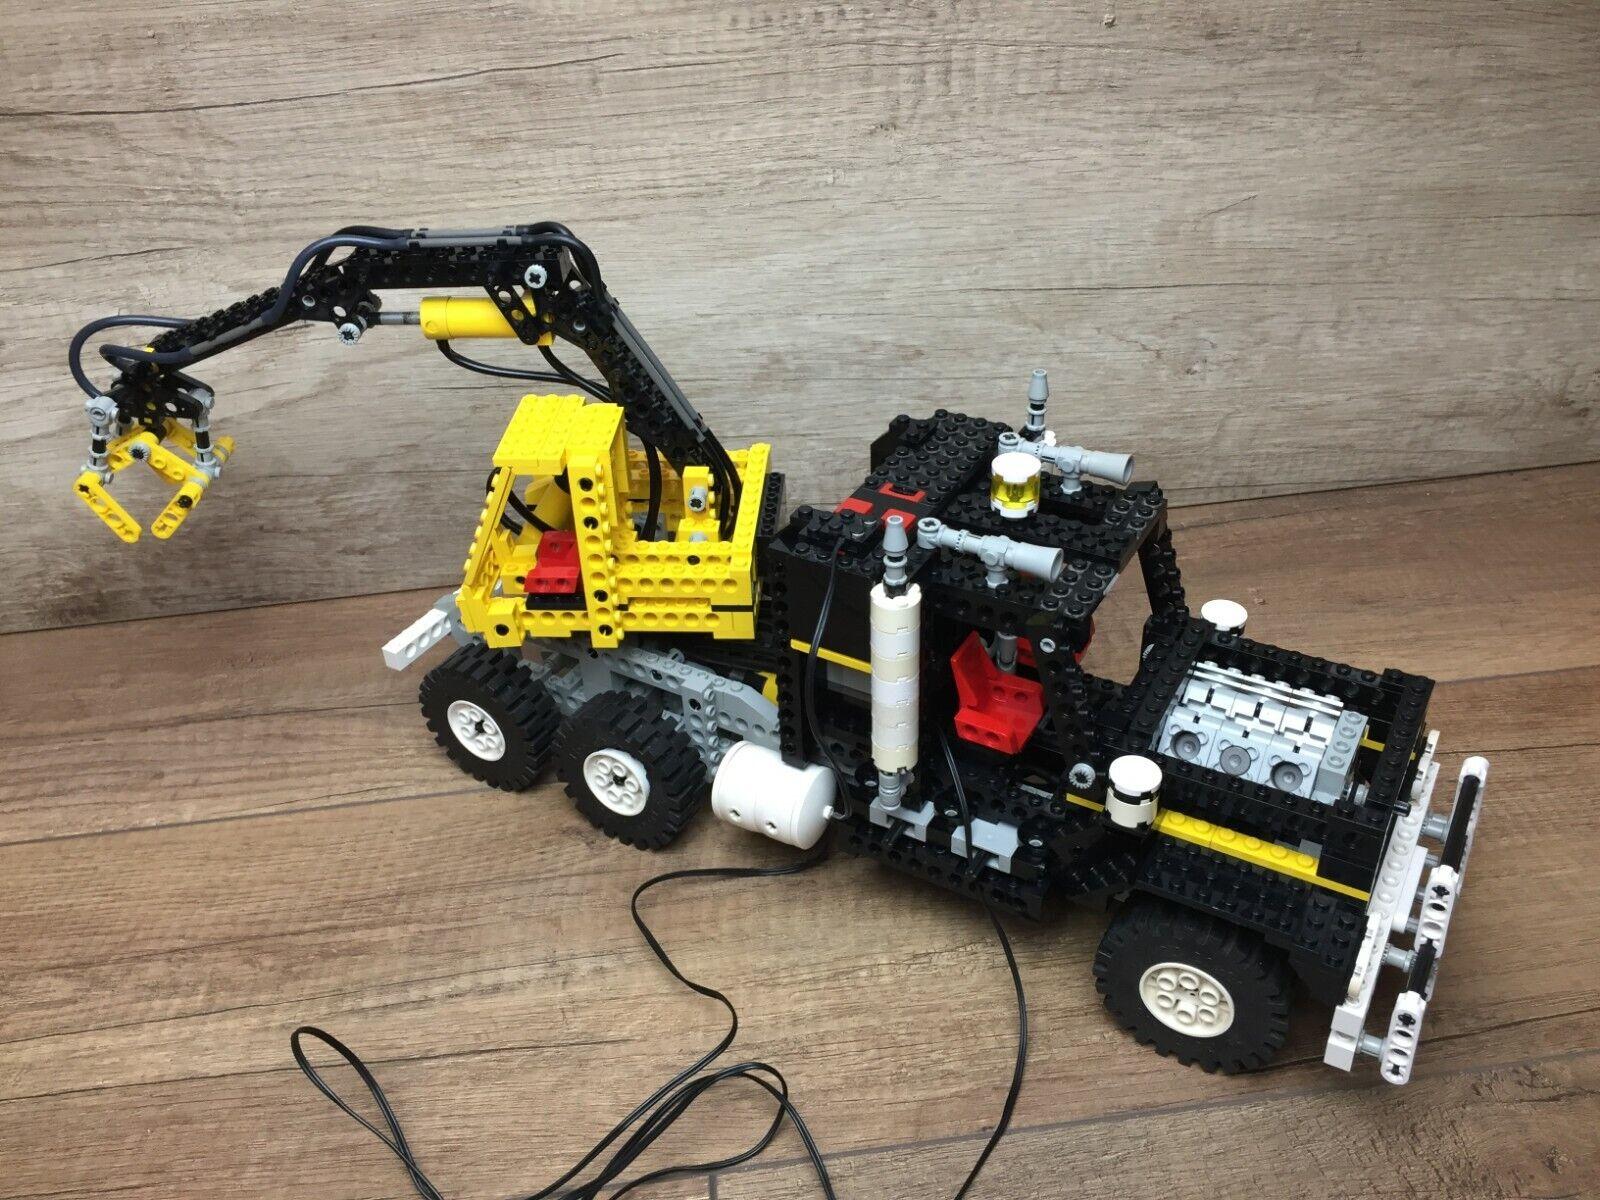 Lego 8868 Airtech claw Rig Pneumatic GRUE CRANE Technic Technique